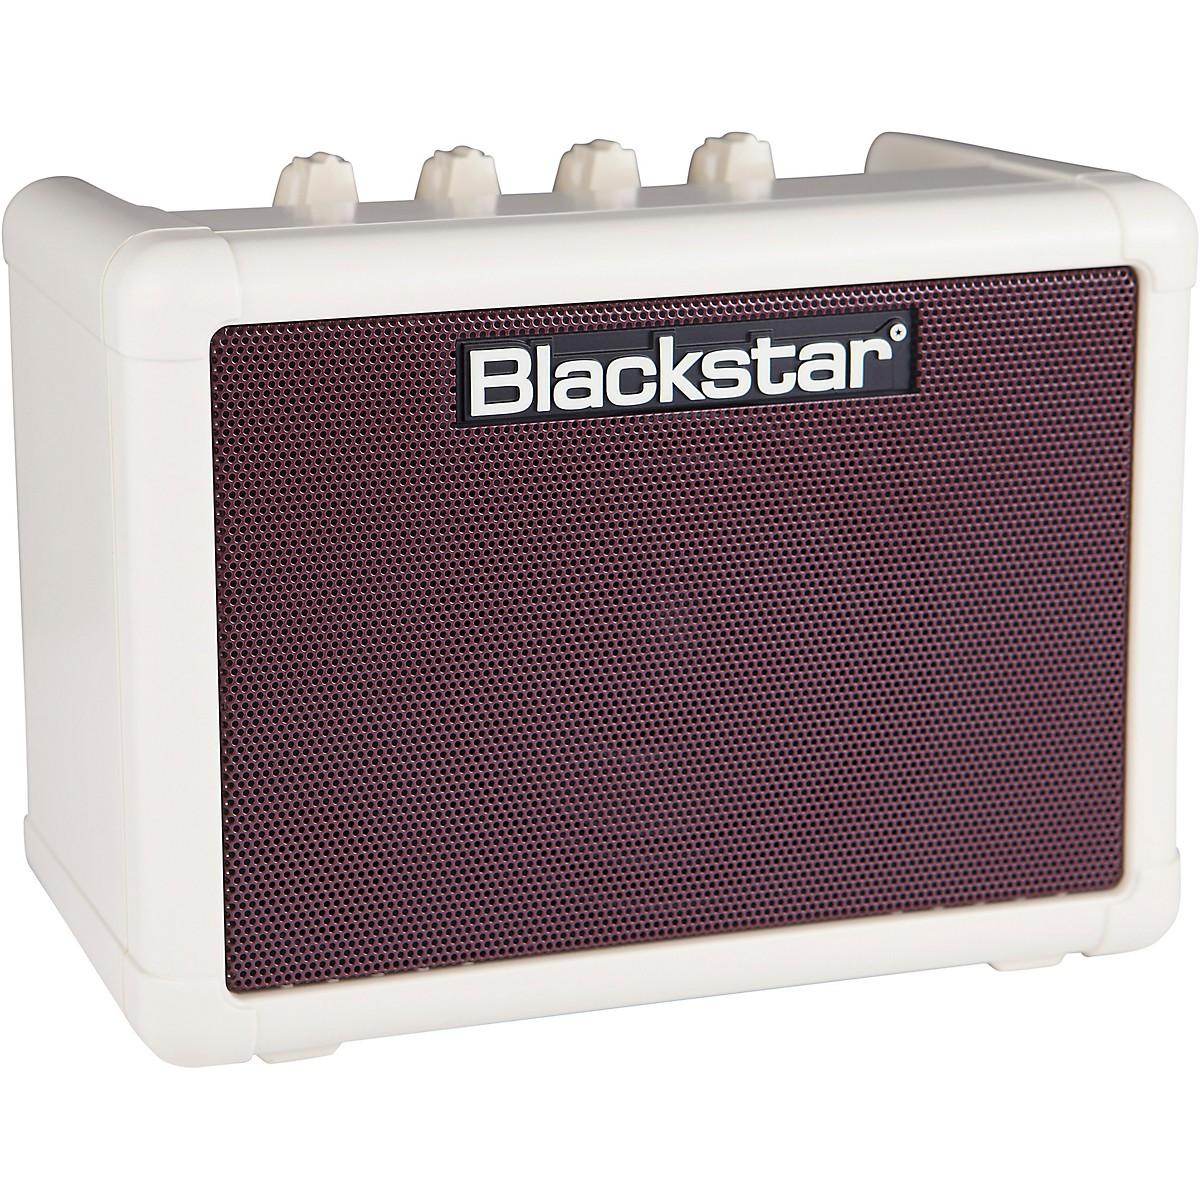 Blackstar Fly 3 3W 1x3 Guitar Combo Amp Vintage Cream Oxblood